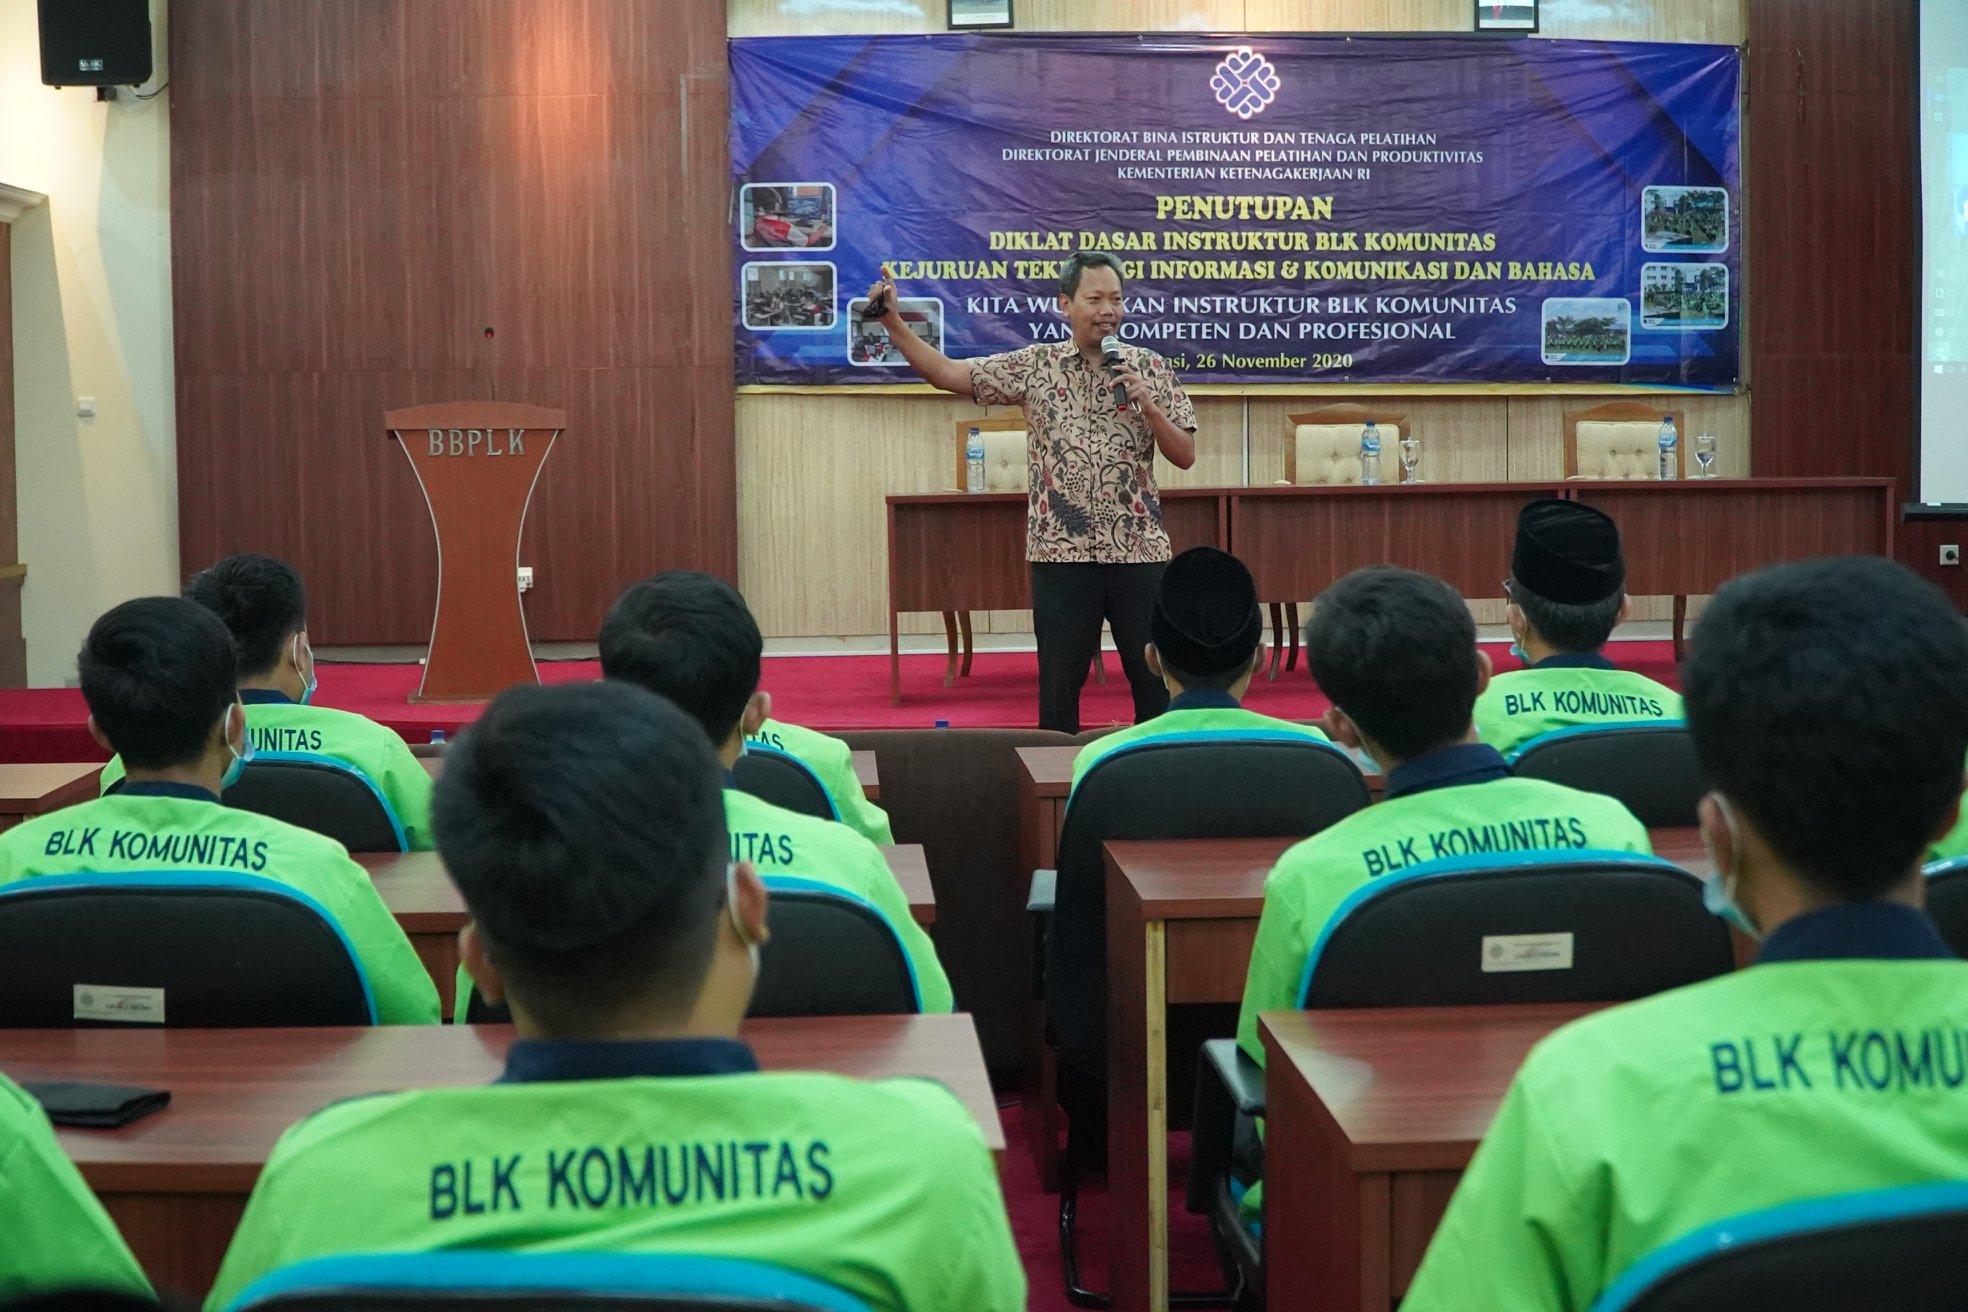 Wujudkan Instruktur BLK Komunitas Kompeten & Profesional